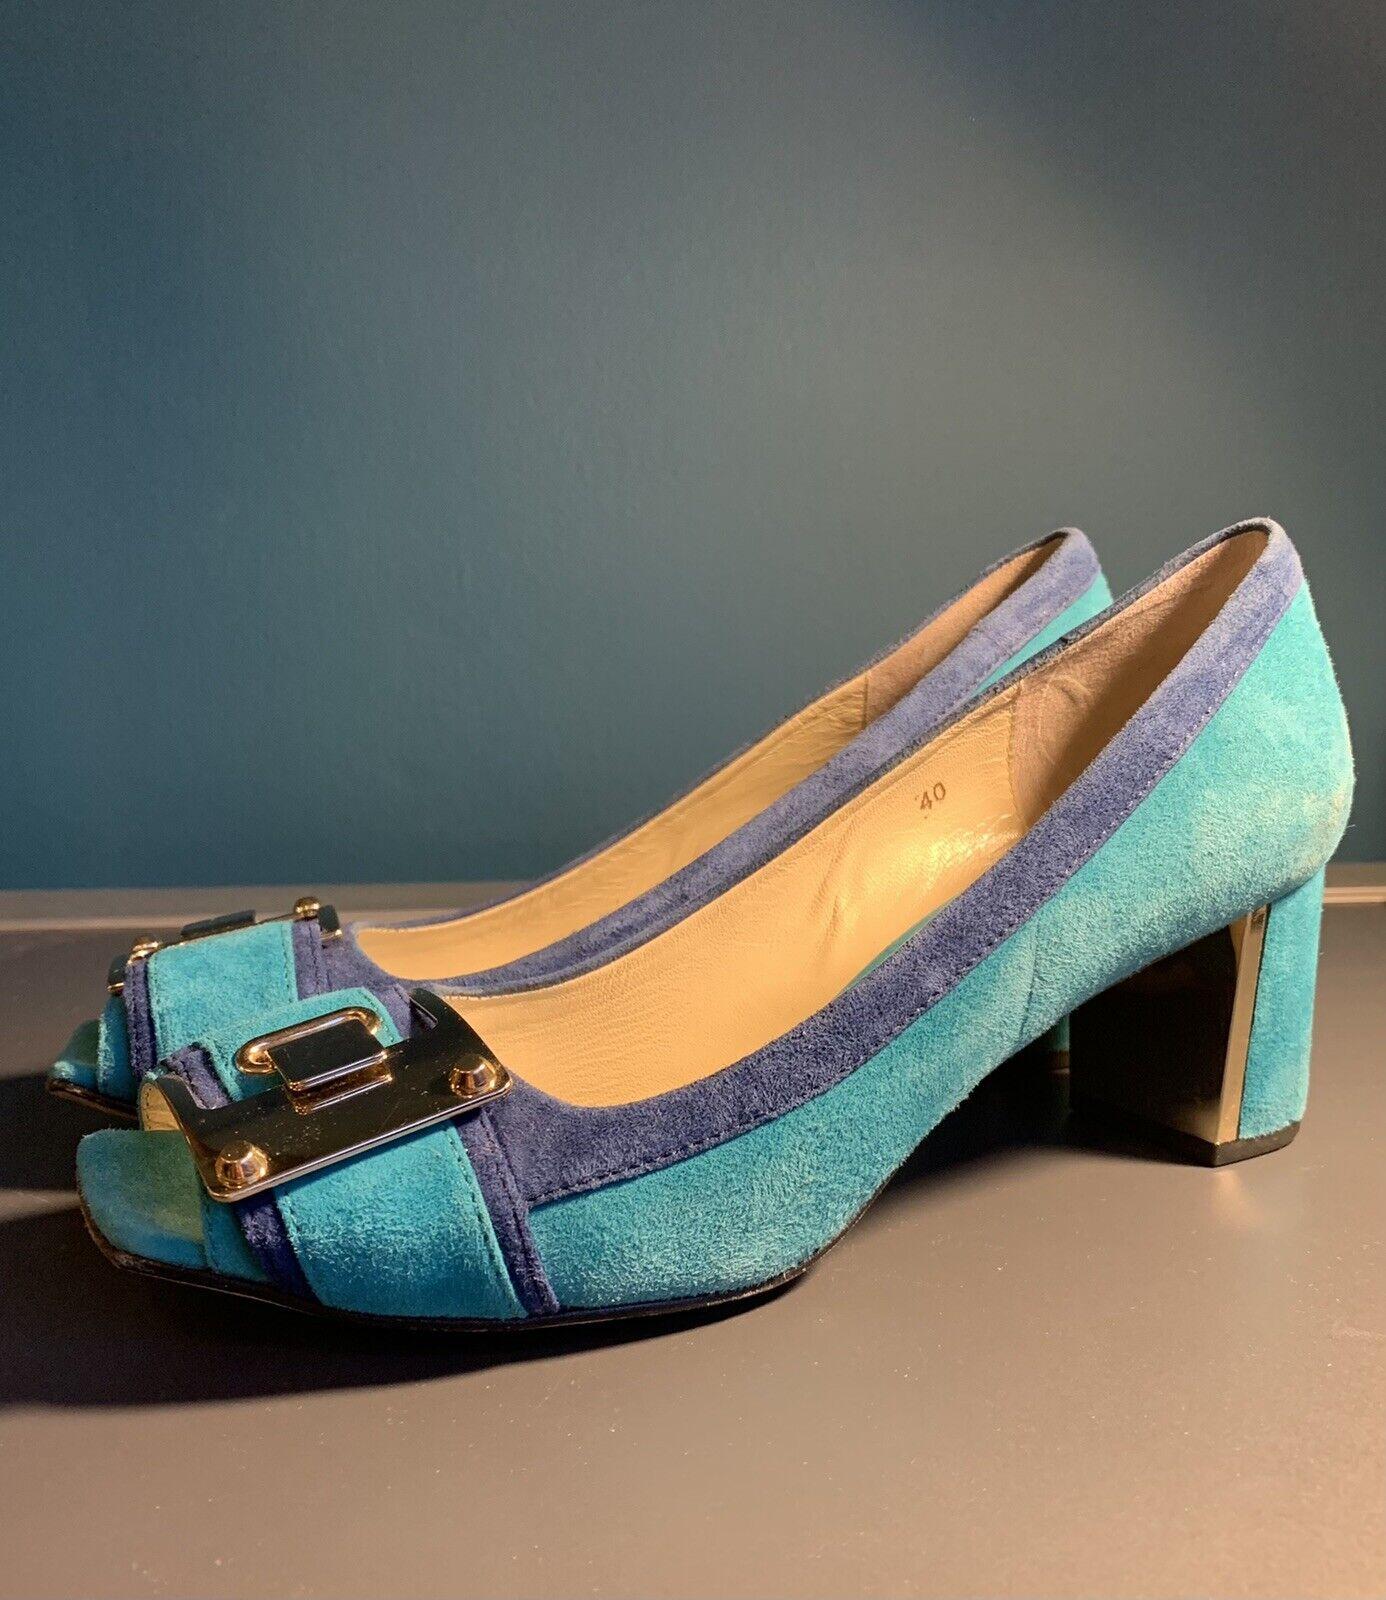 Luciano Barachini Size 40 All Leather/suede Turquoise & Blue Mod Shoes Peep Toe